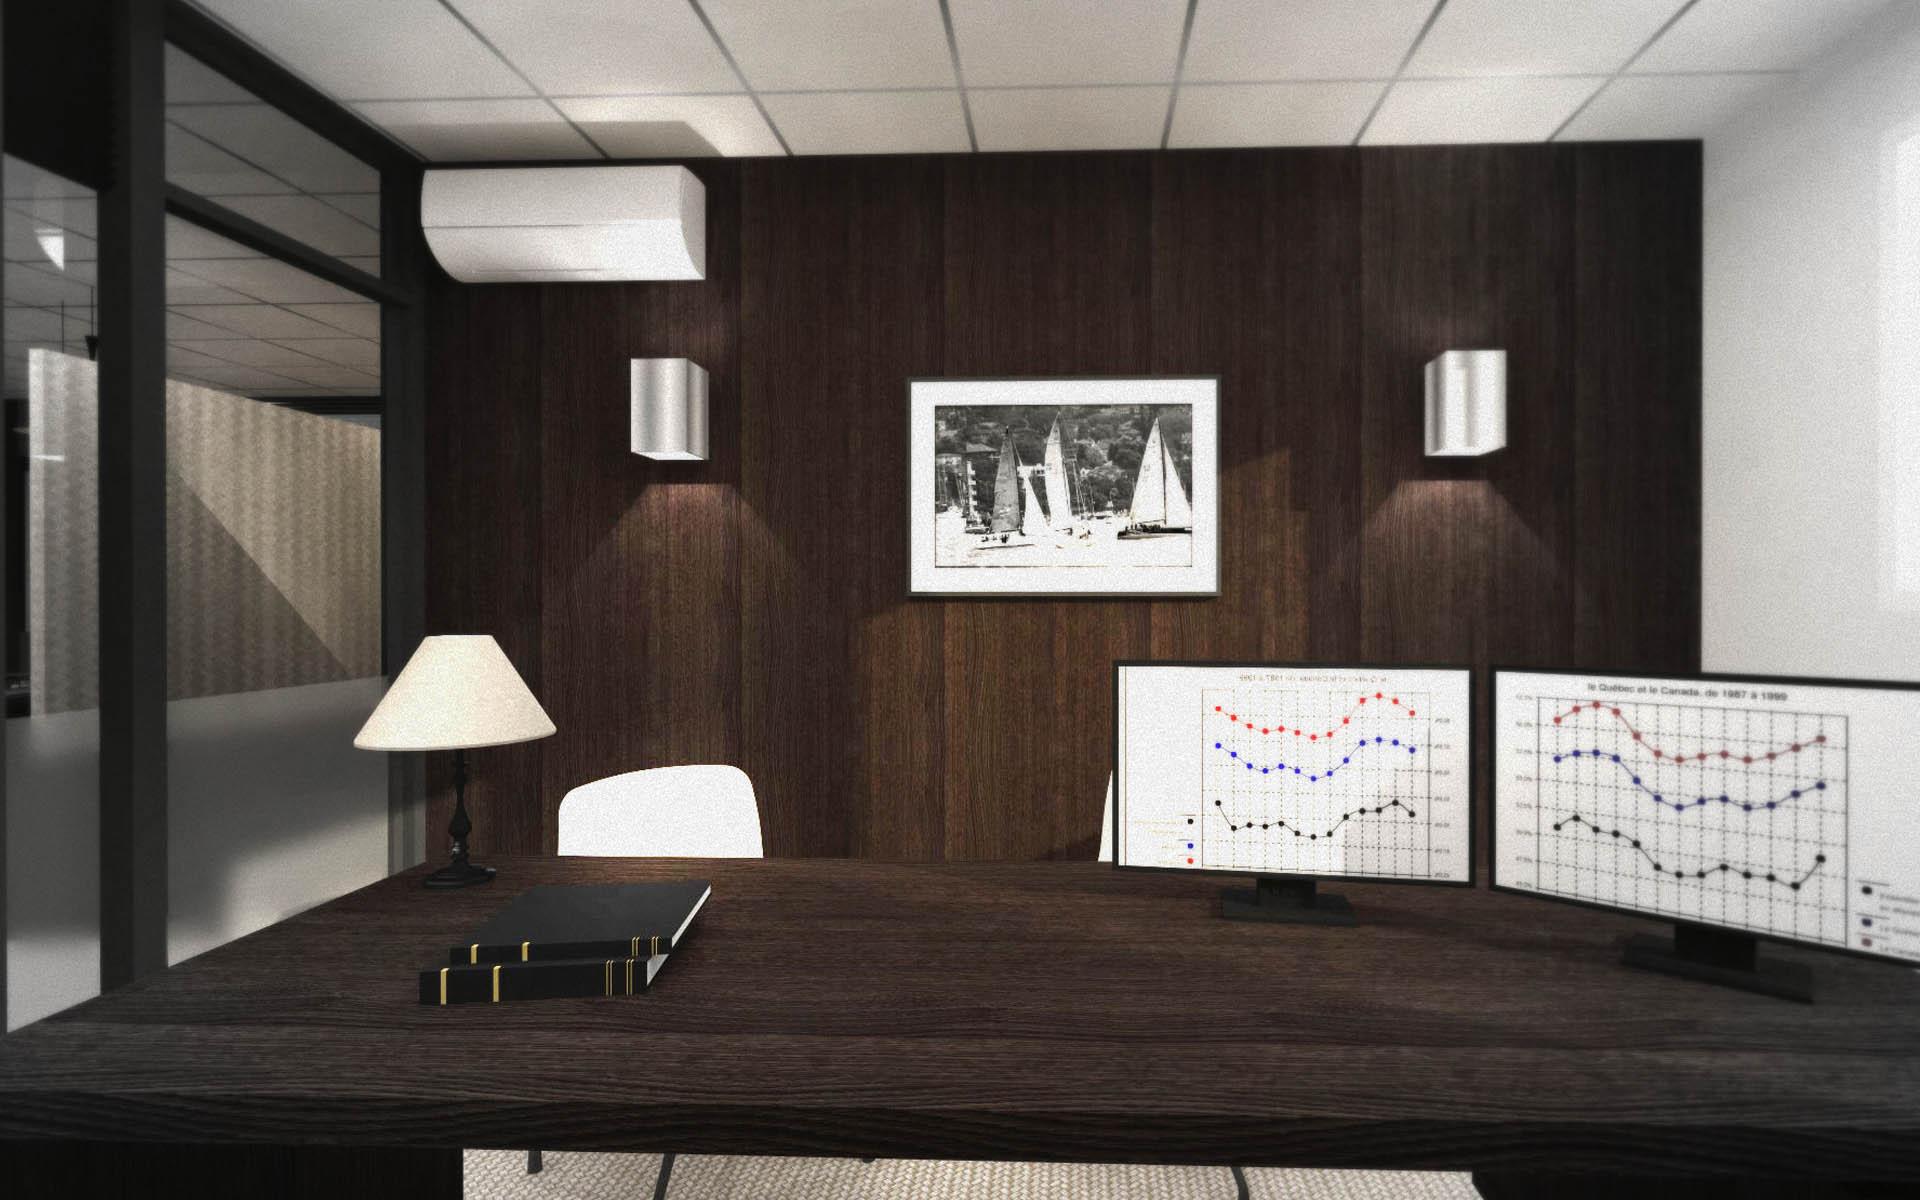 bureaux aix en provence red banana studio concepteur d 39 int rieur. Black Bedroom Furniture Sets. Home Design Ideas